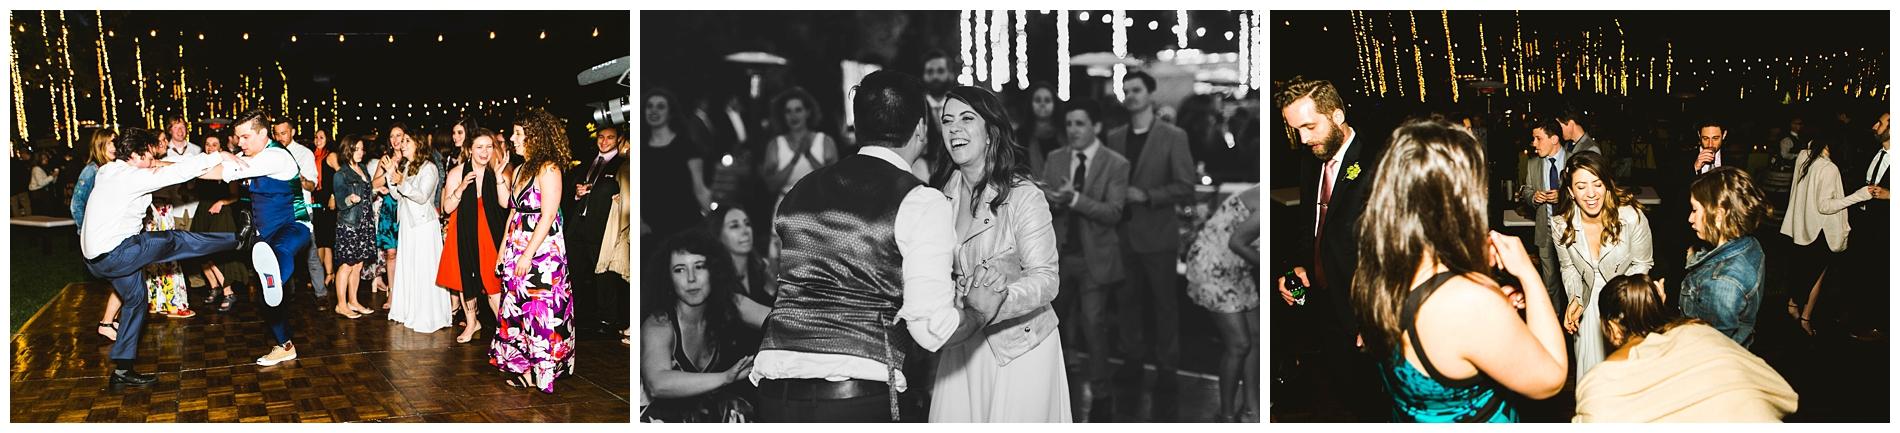 Saddlerock Ranch WeddingPhotography_0068.jpg